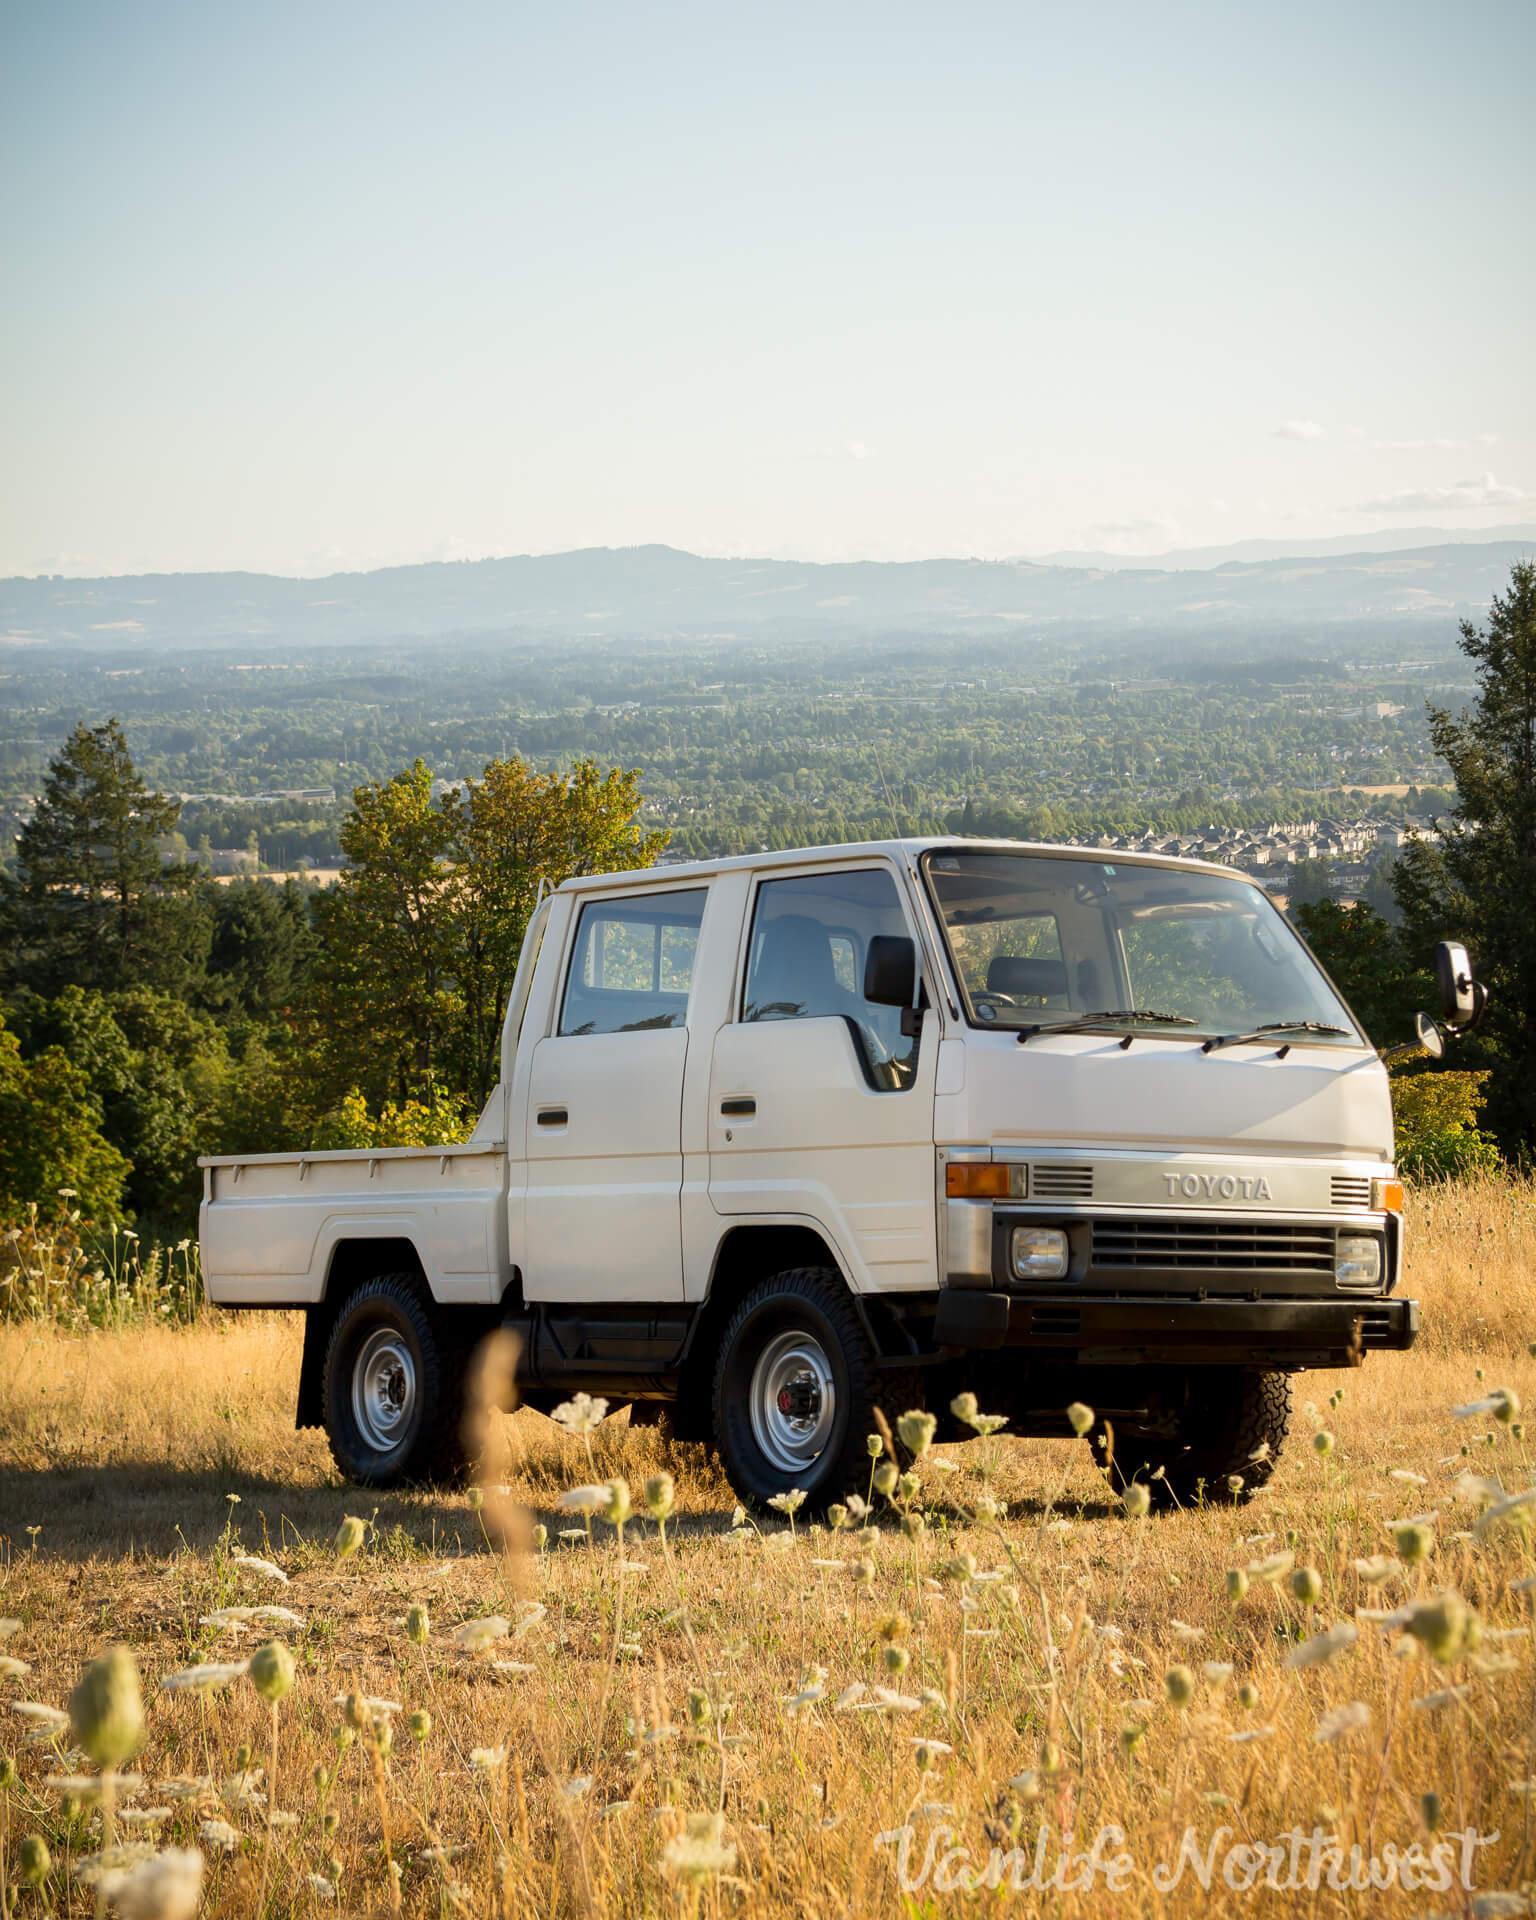 ToyotaHiaceLH85WhiteJosh-7.jpg